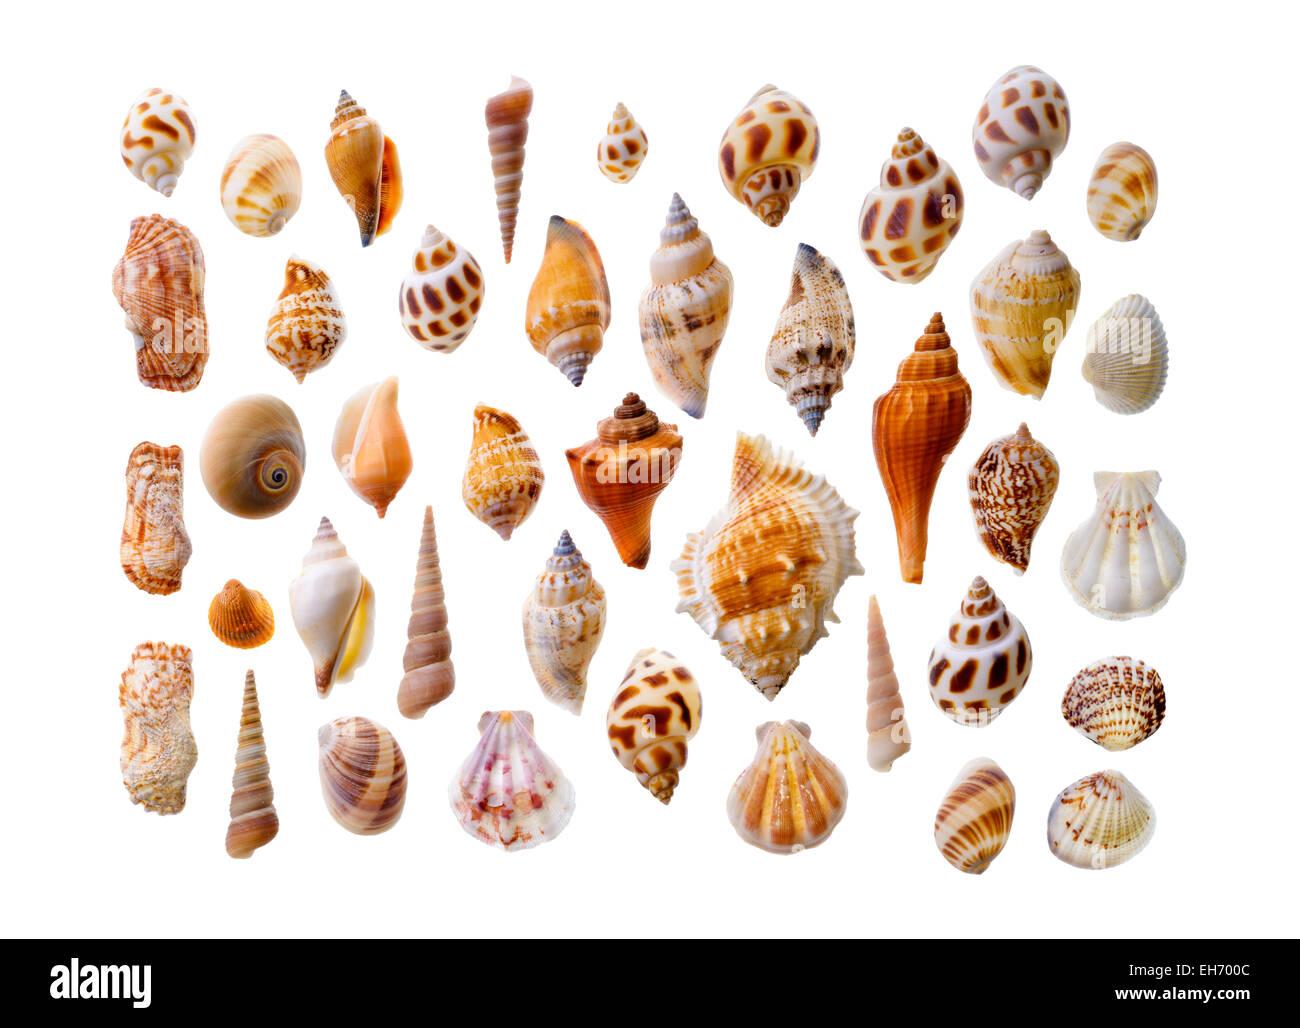 isolated objects assorted seashells isolated on white background